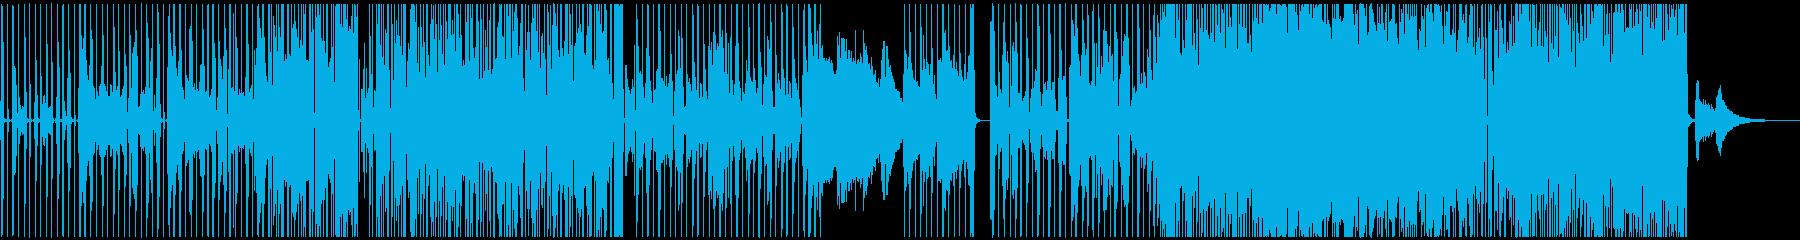 SAYONARA INAGOの再生済みの波形